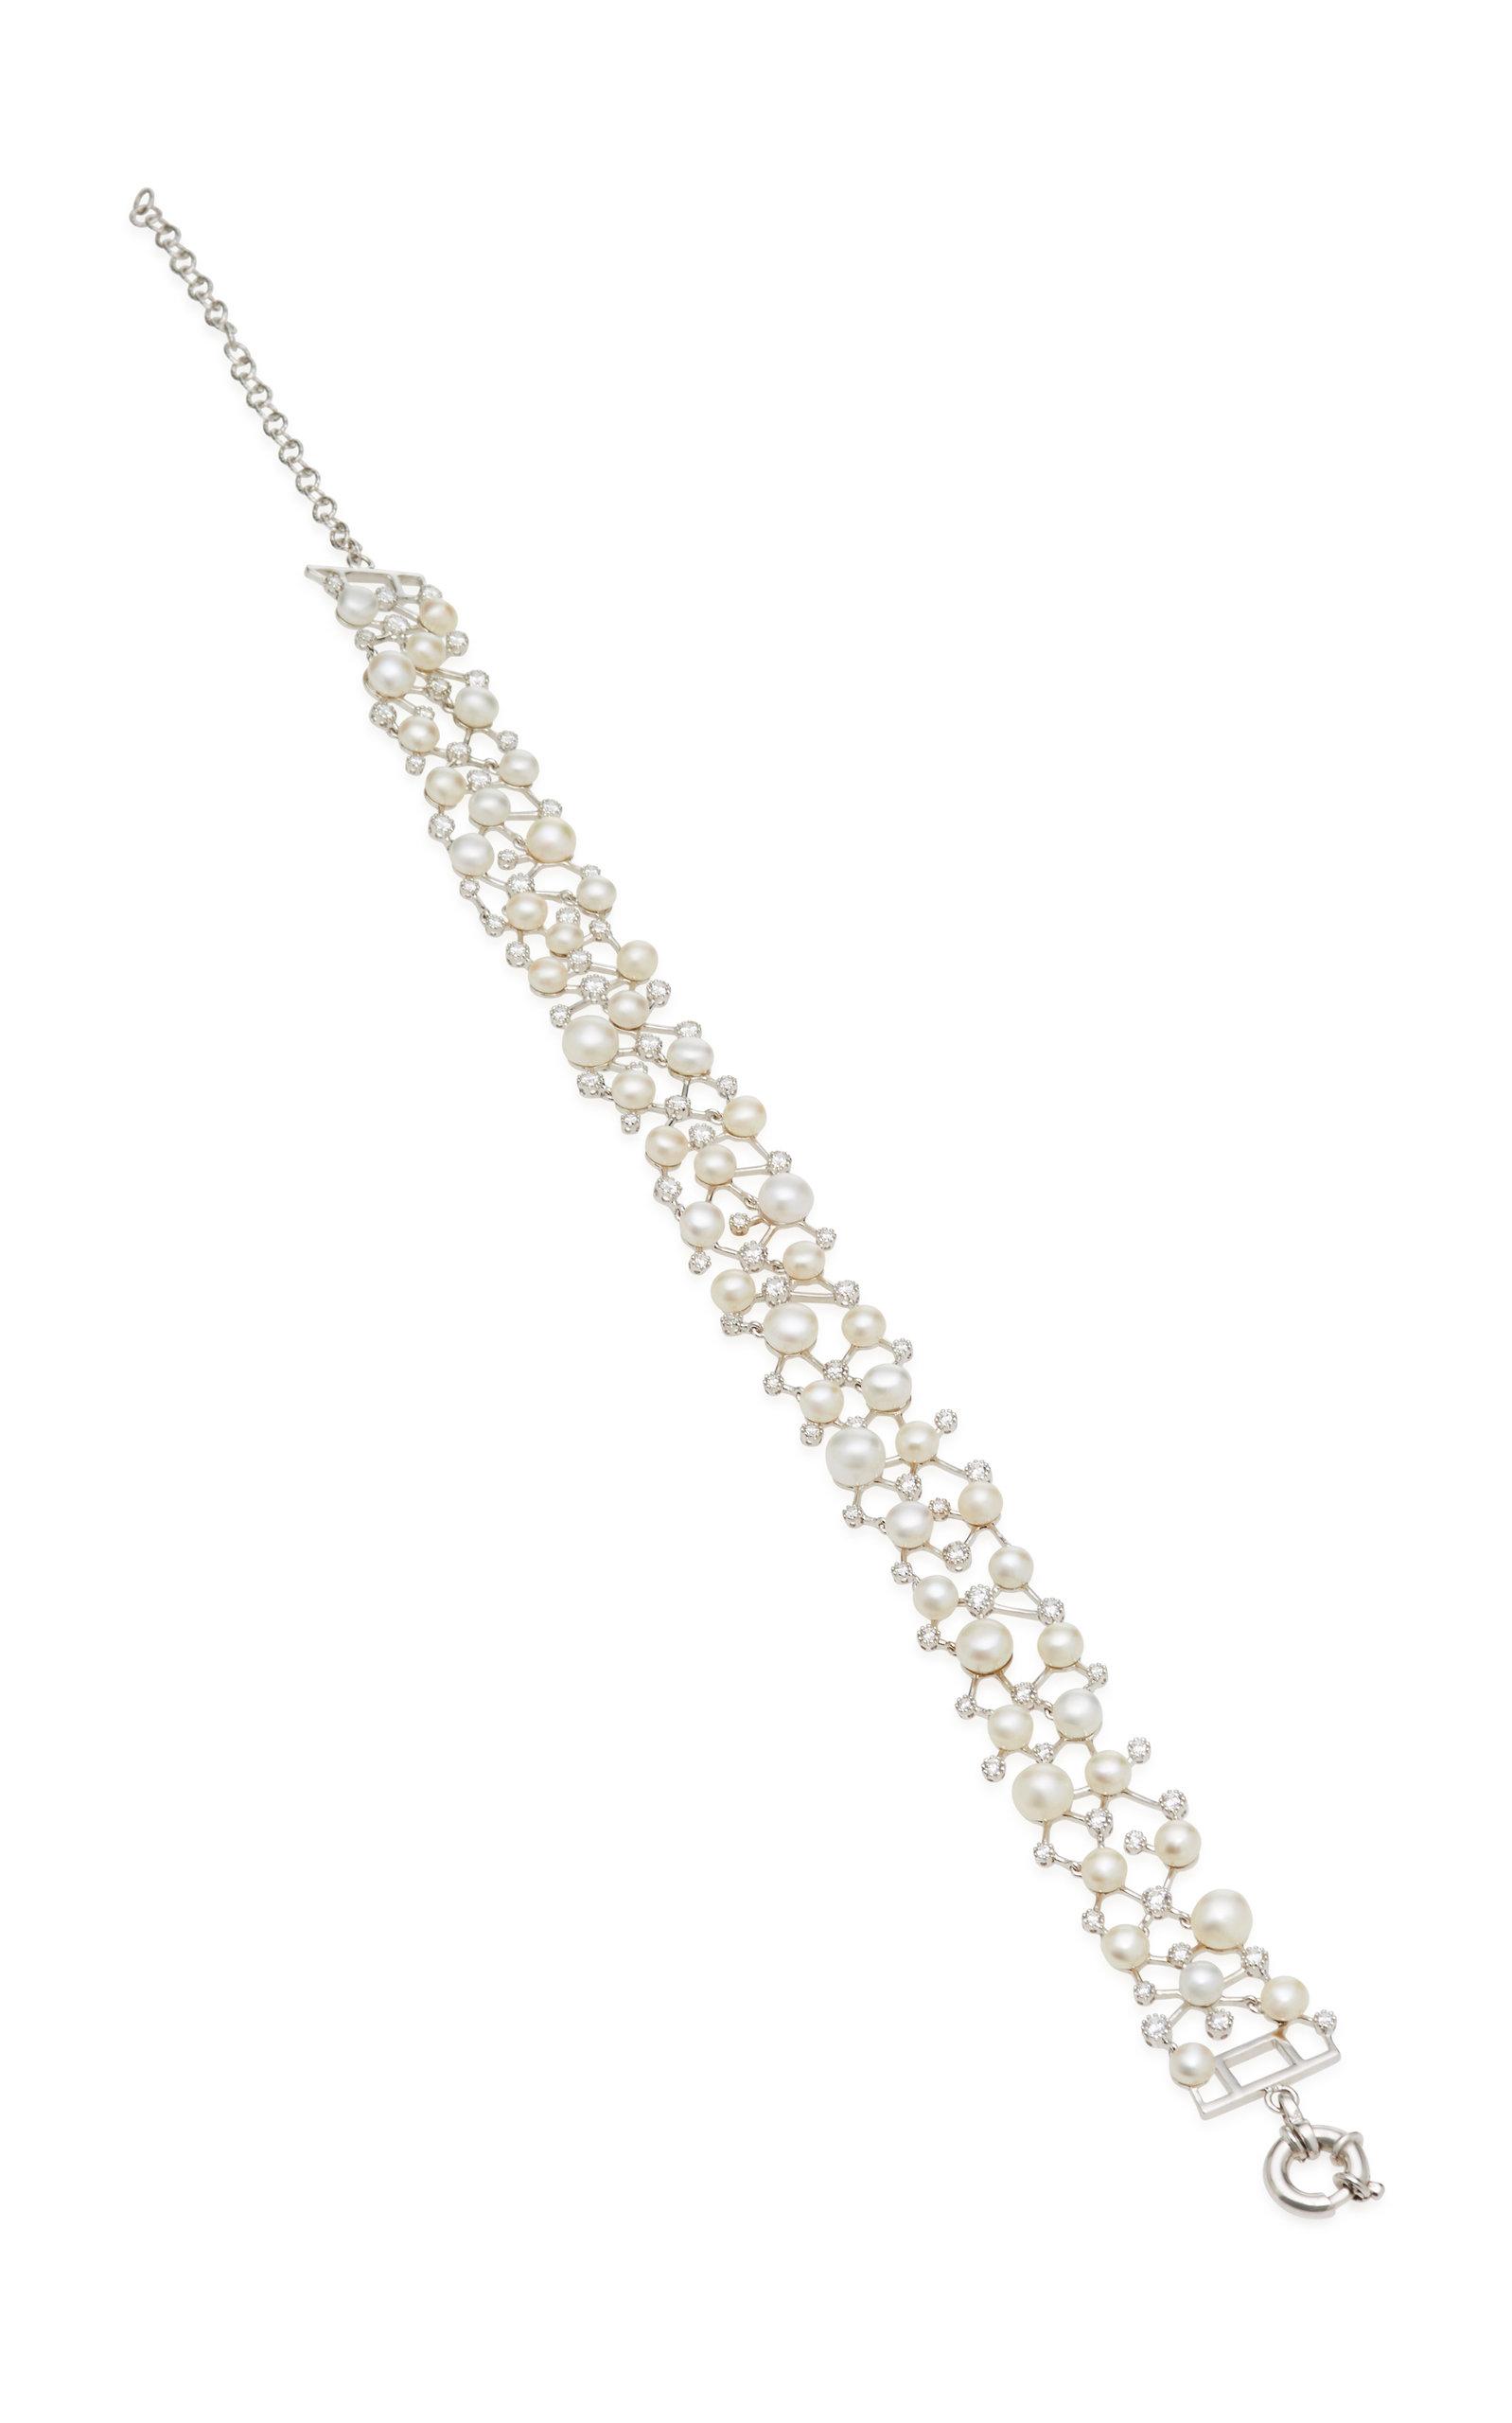 ANABELA CHAN CONSTELLATION 18K WHITE GOLD VERMEIL DIAMOND AND PEARL CHOKER